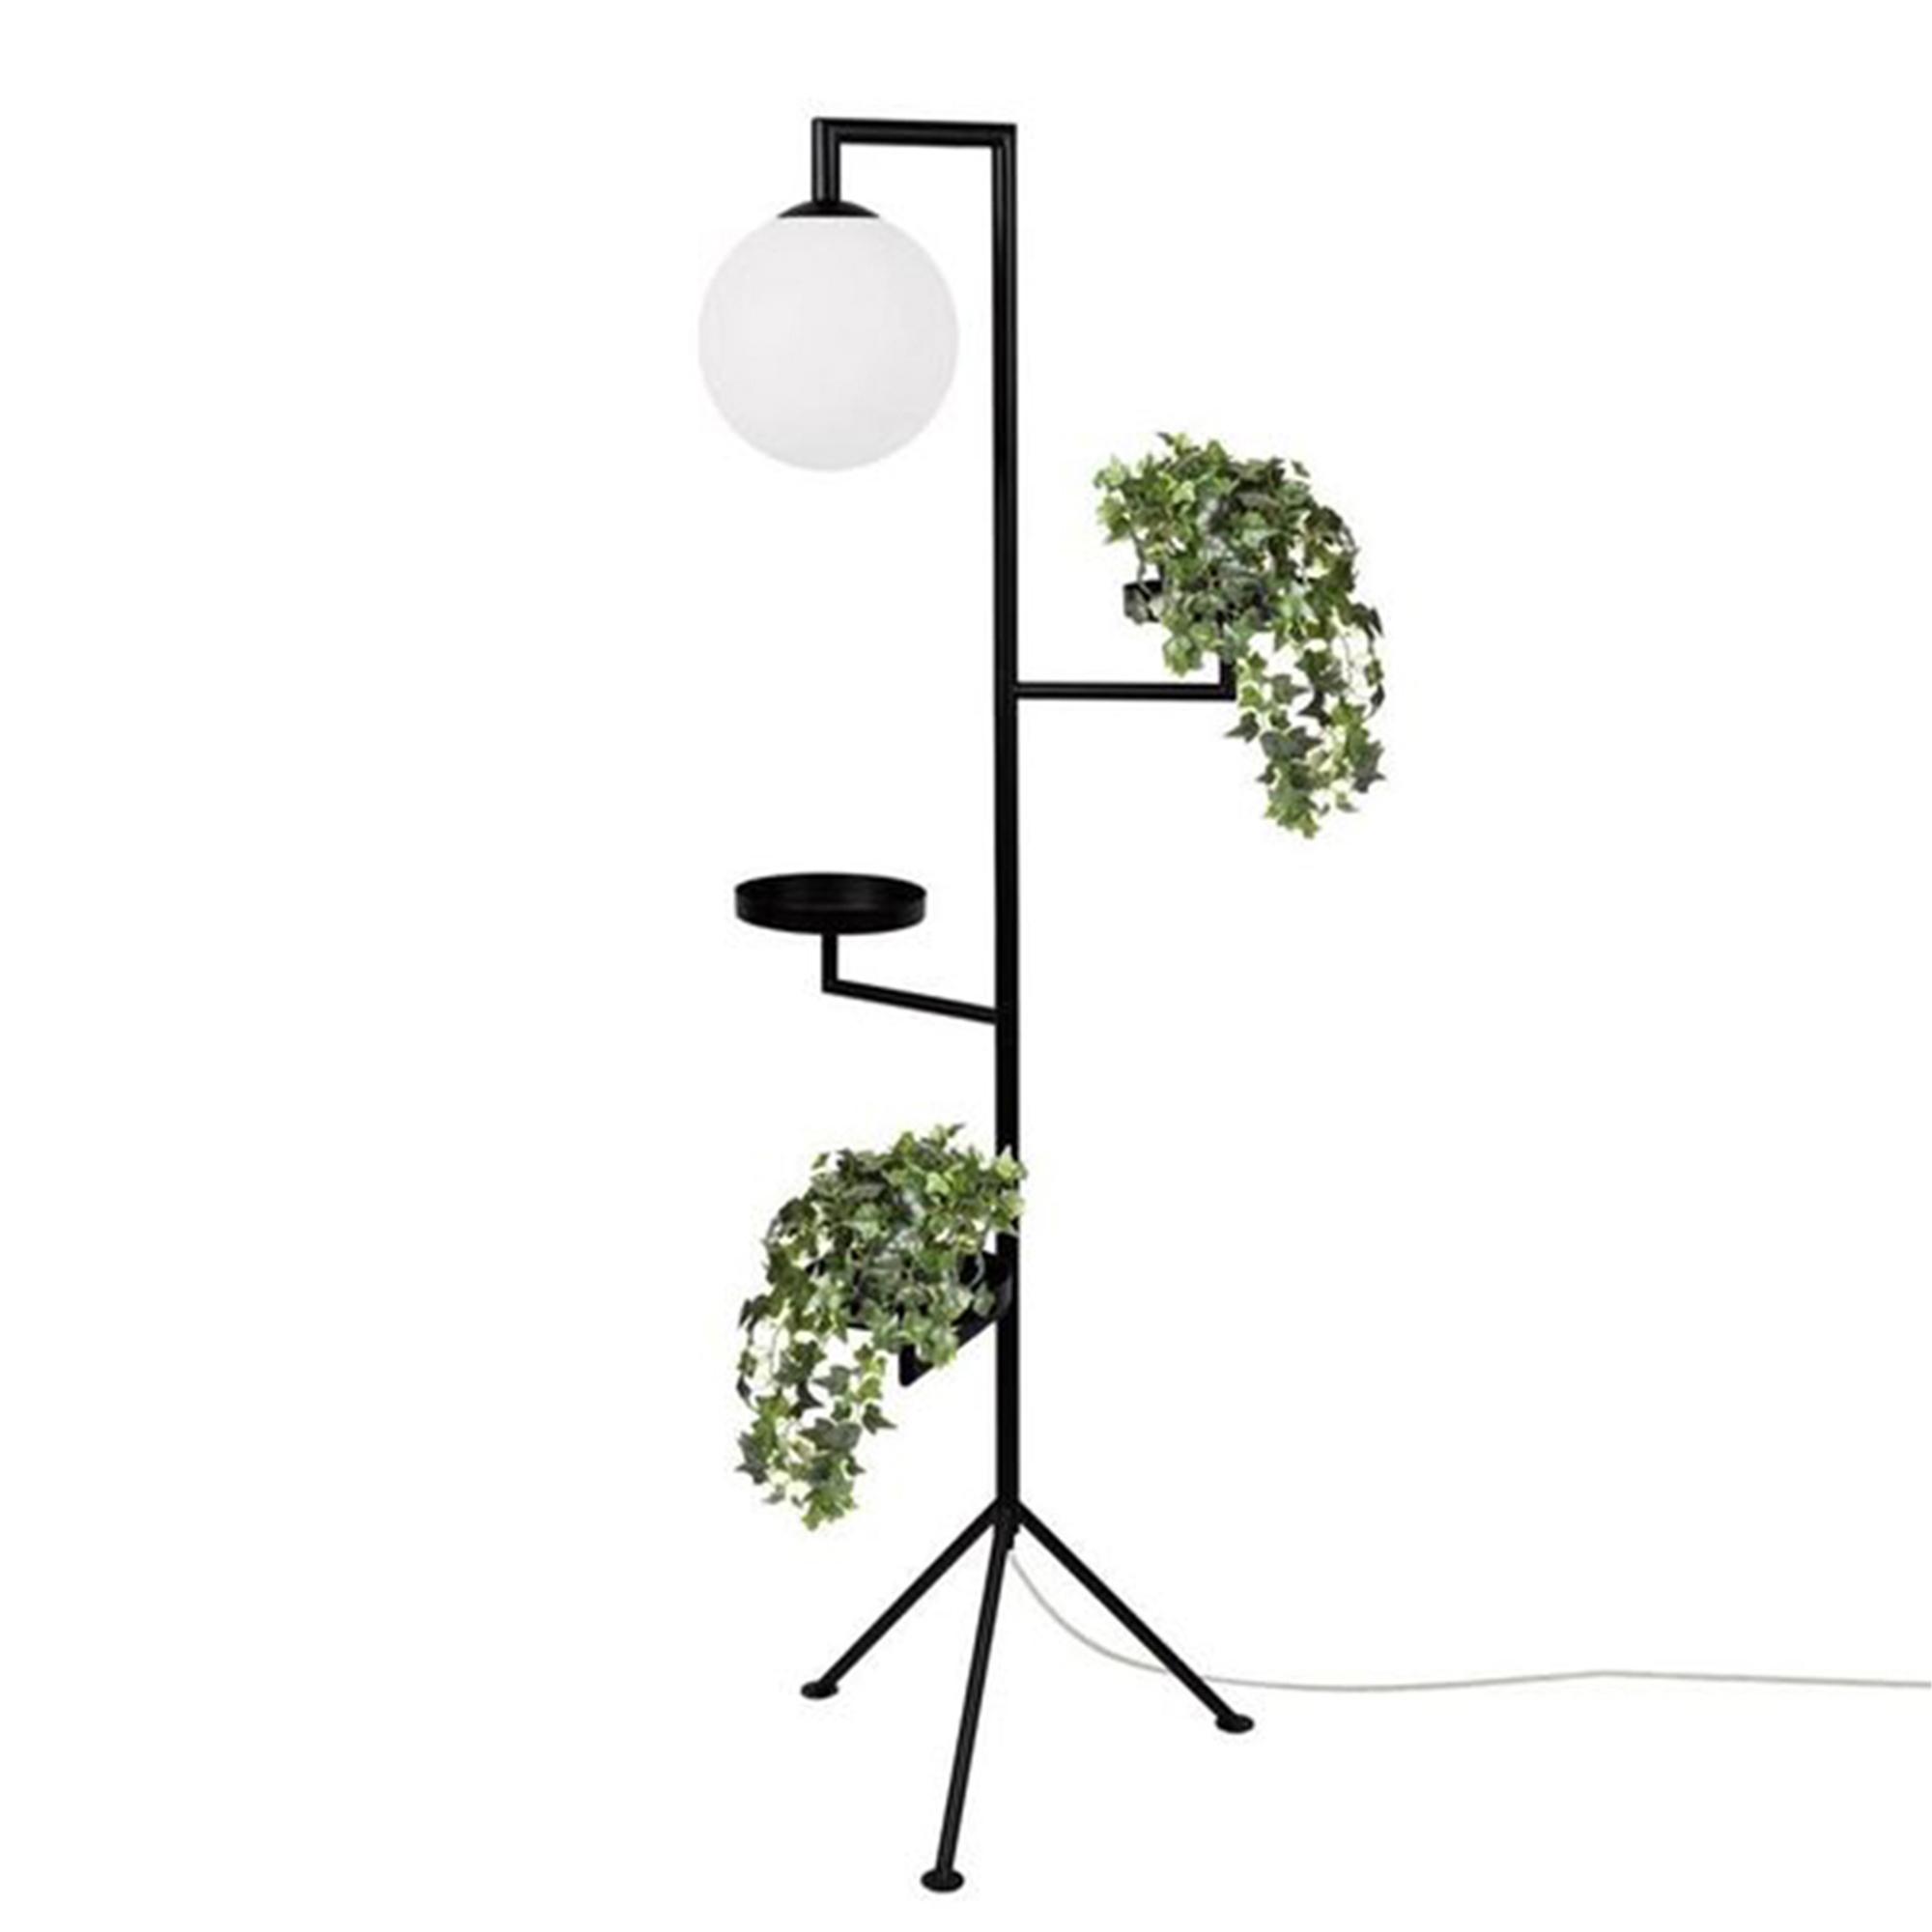 Globen Lighting Golvlampa Astoria svart